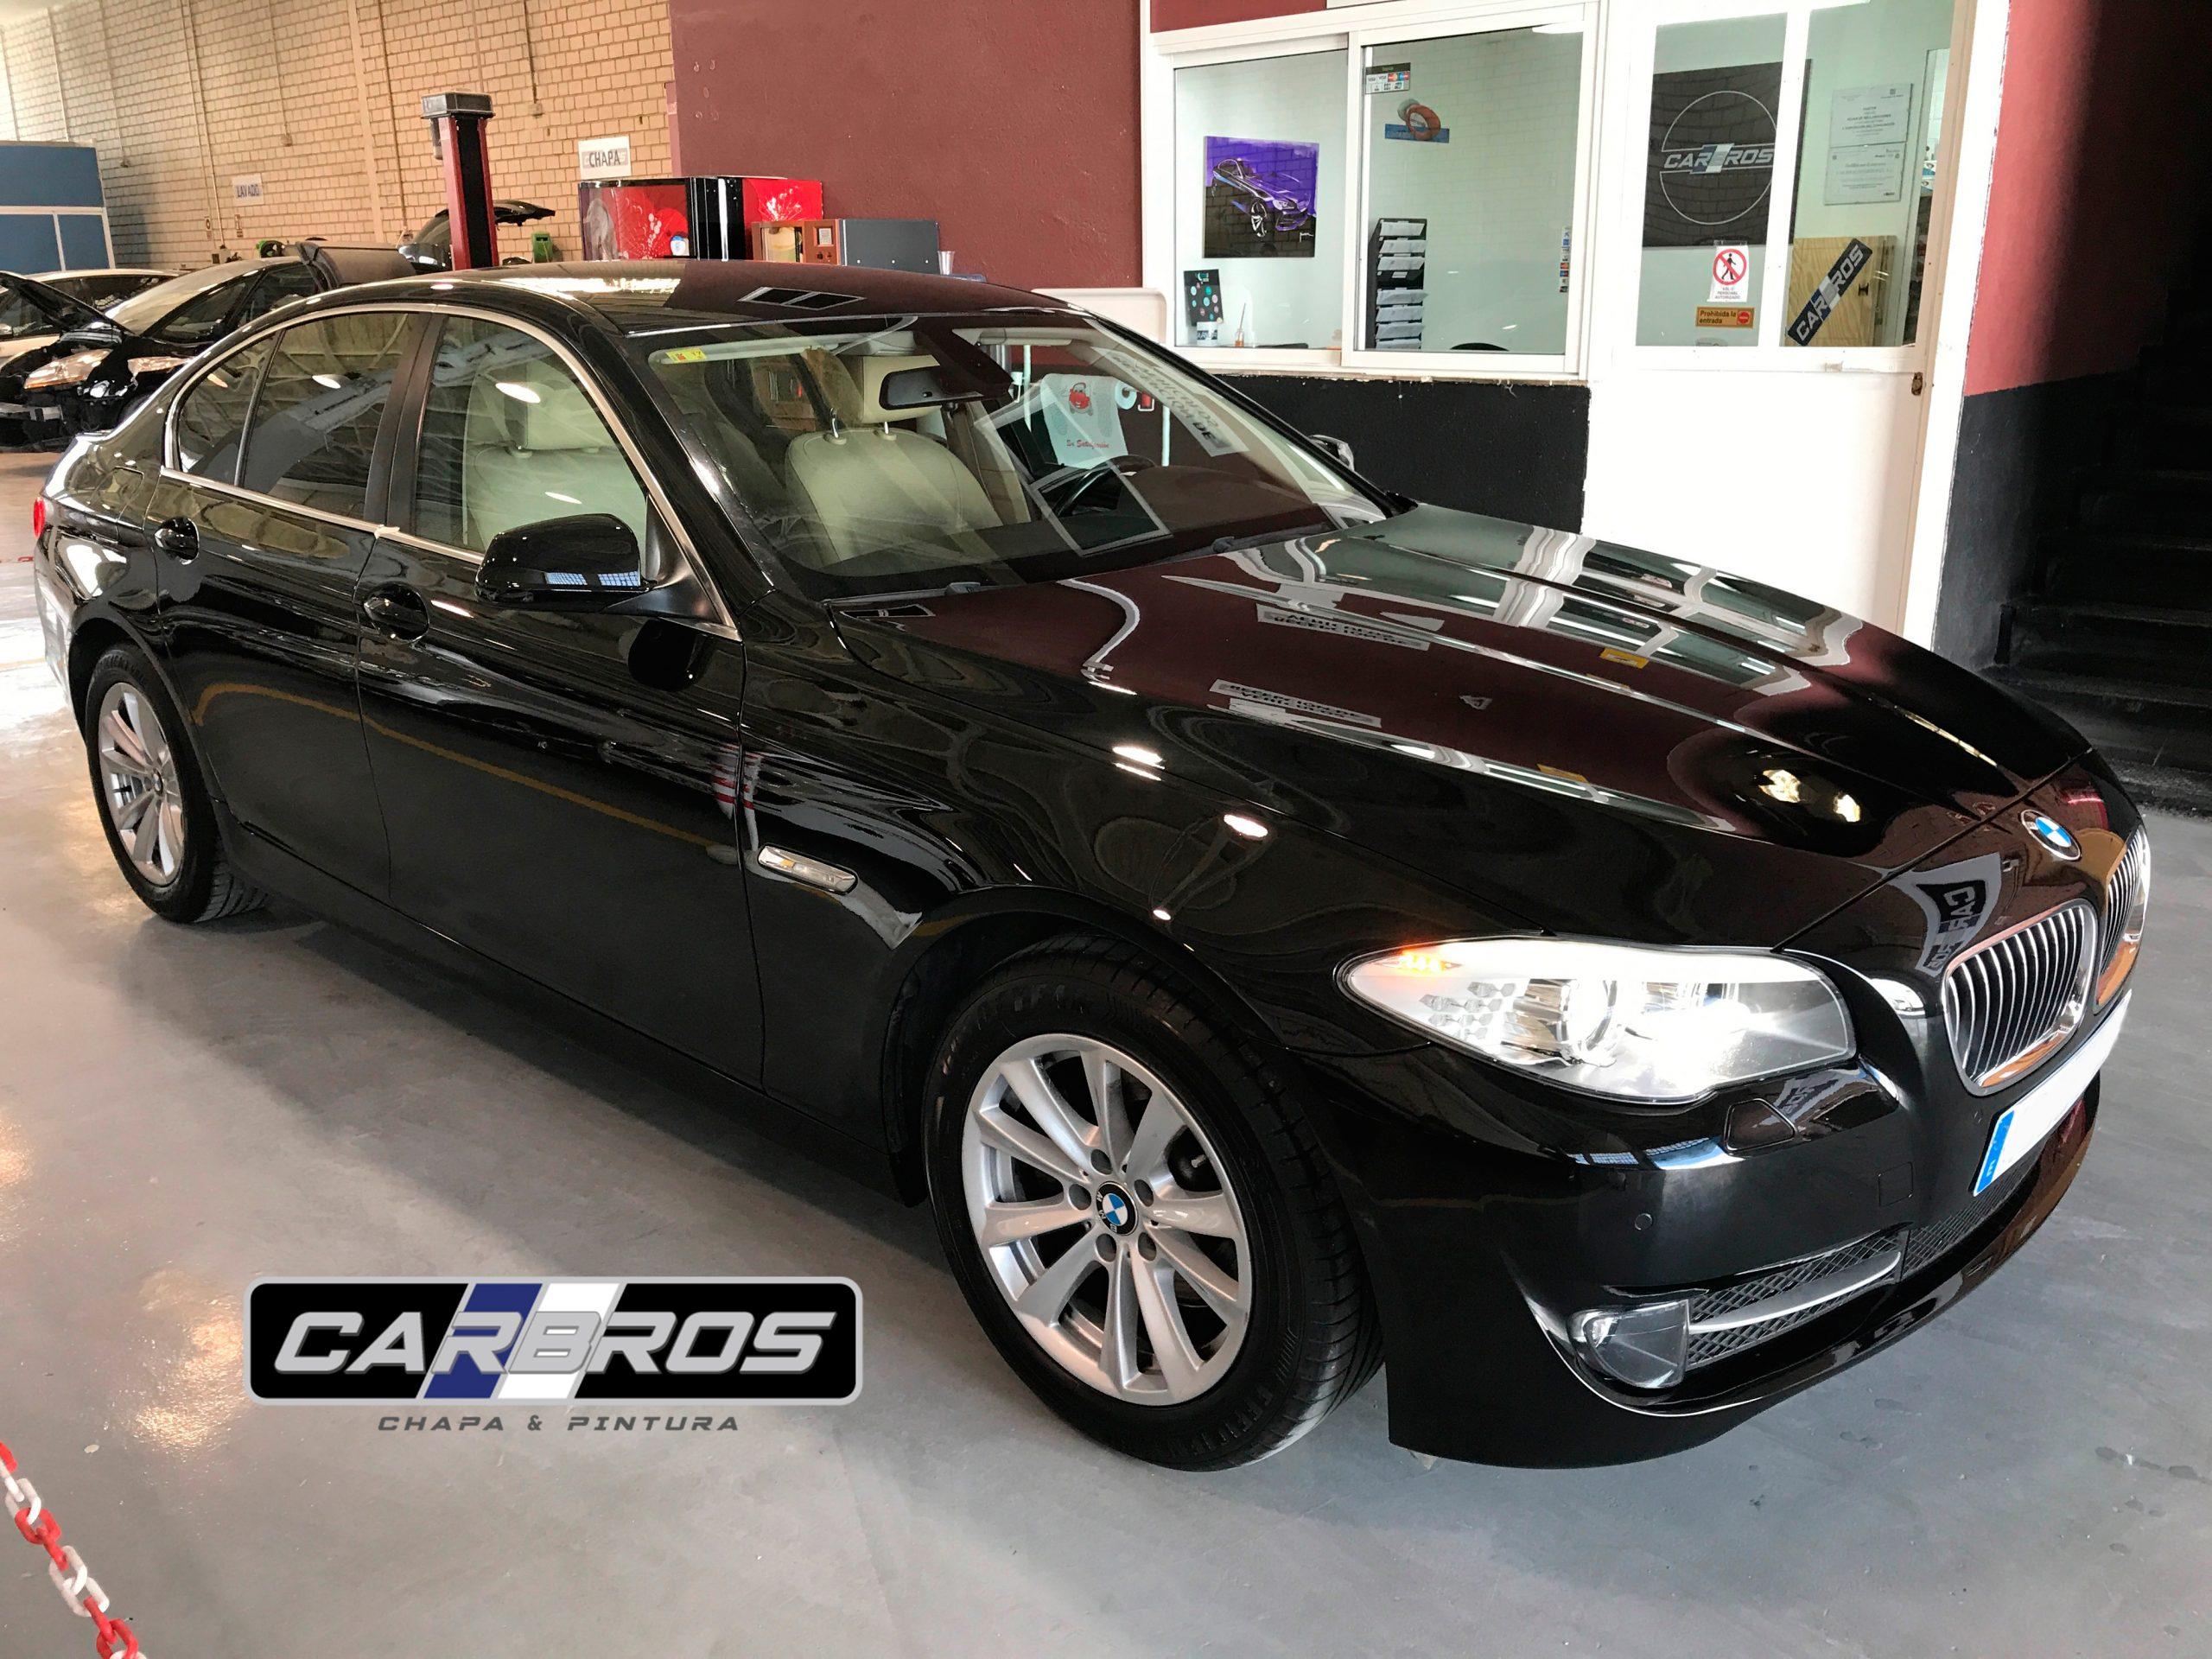 BMW Taller chapa y pintura Mapfre